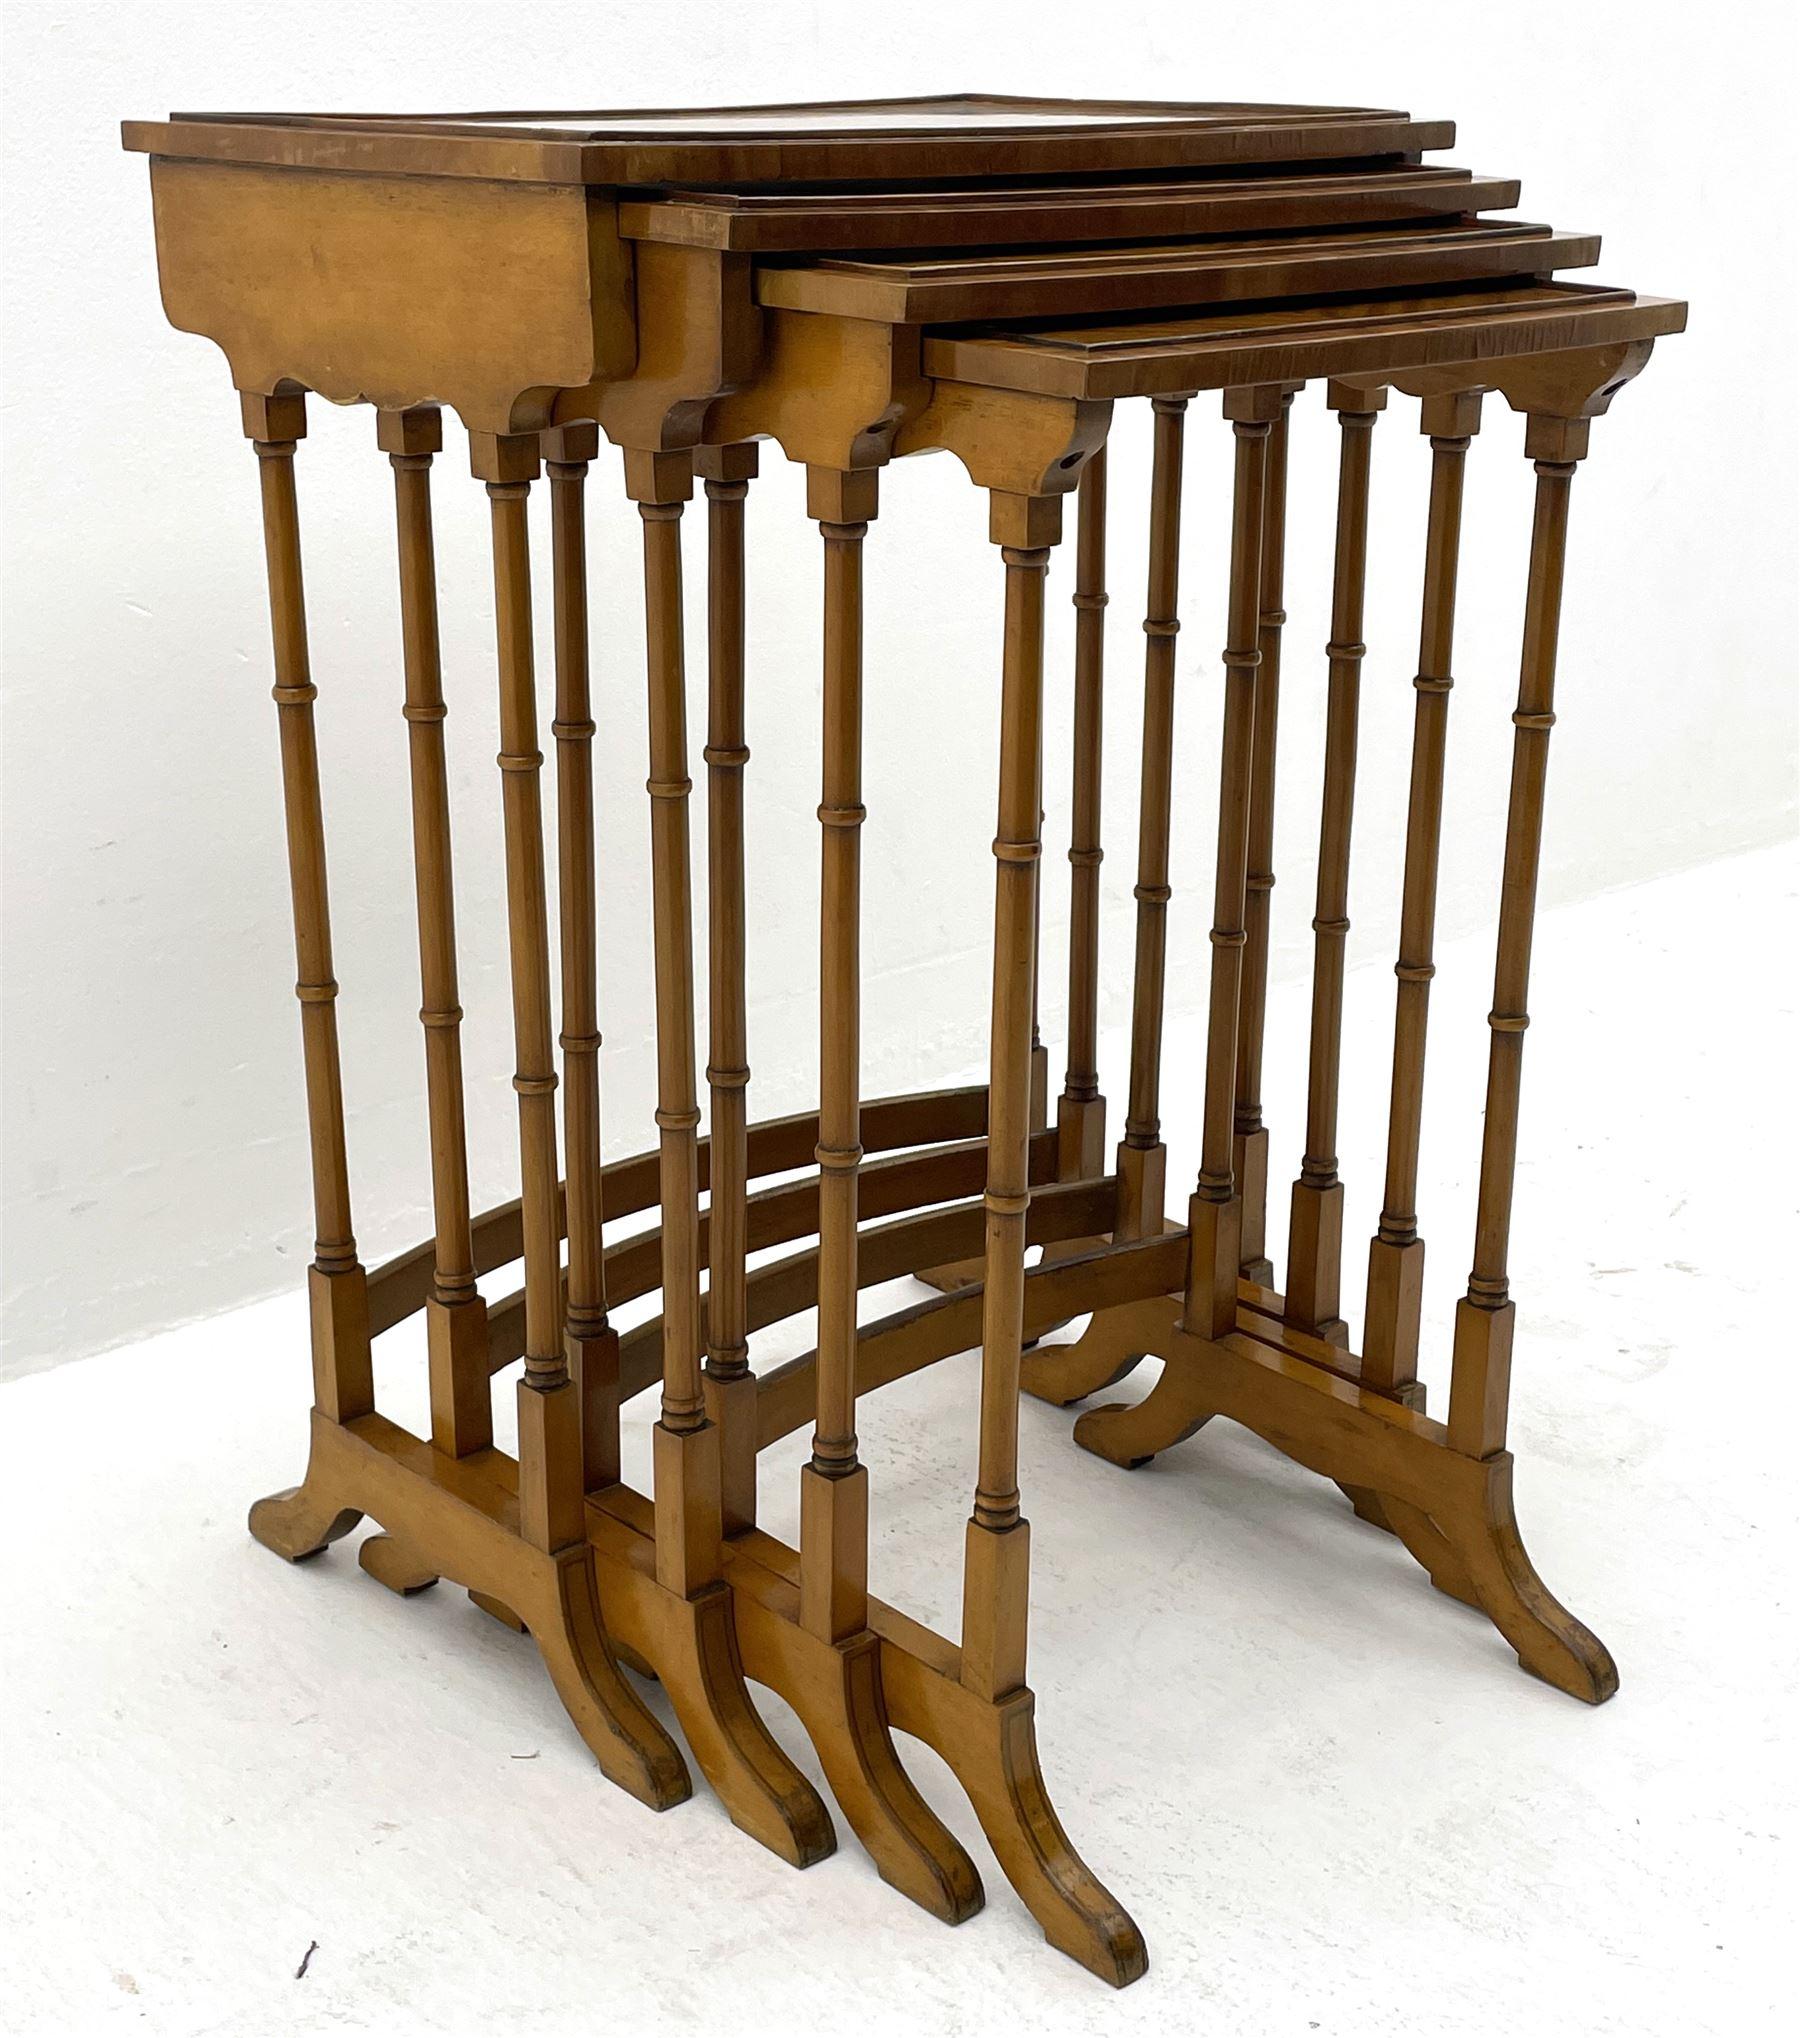 Edwardian satinwood quartetto nest of occasional tables - Image 4 of 6